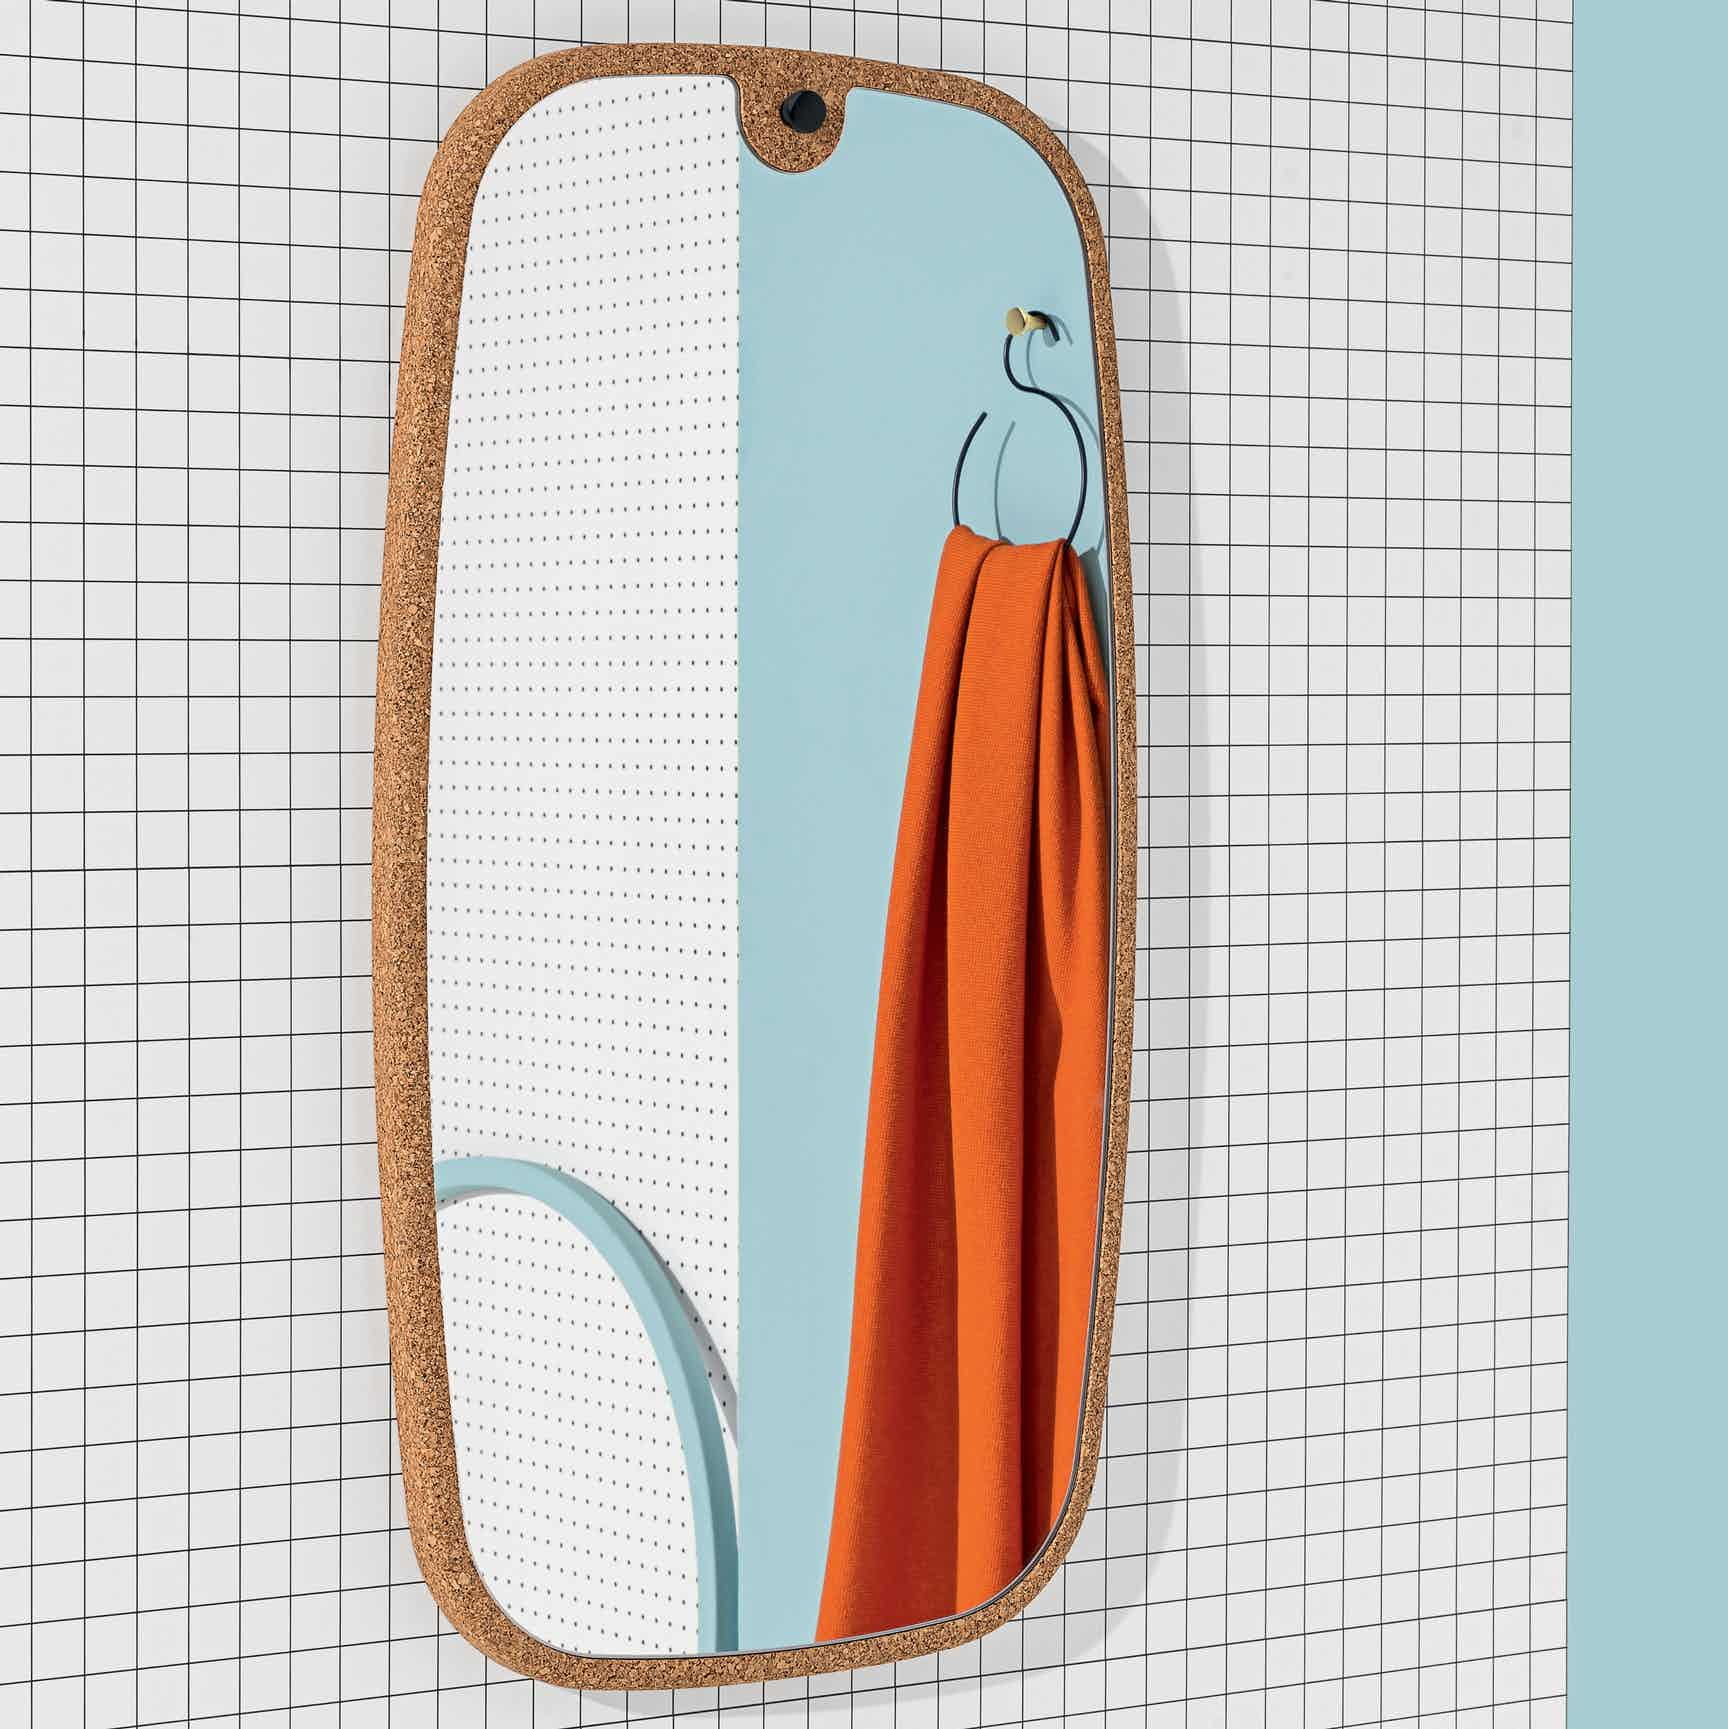 Discipline Komiro Wall Hanging Mirror Haute Living